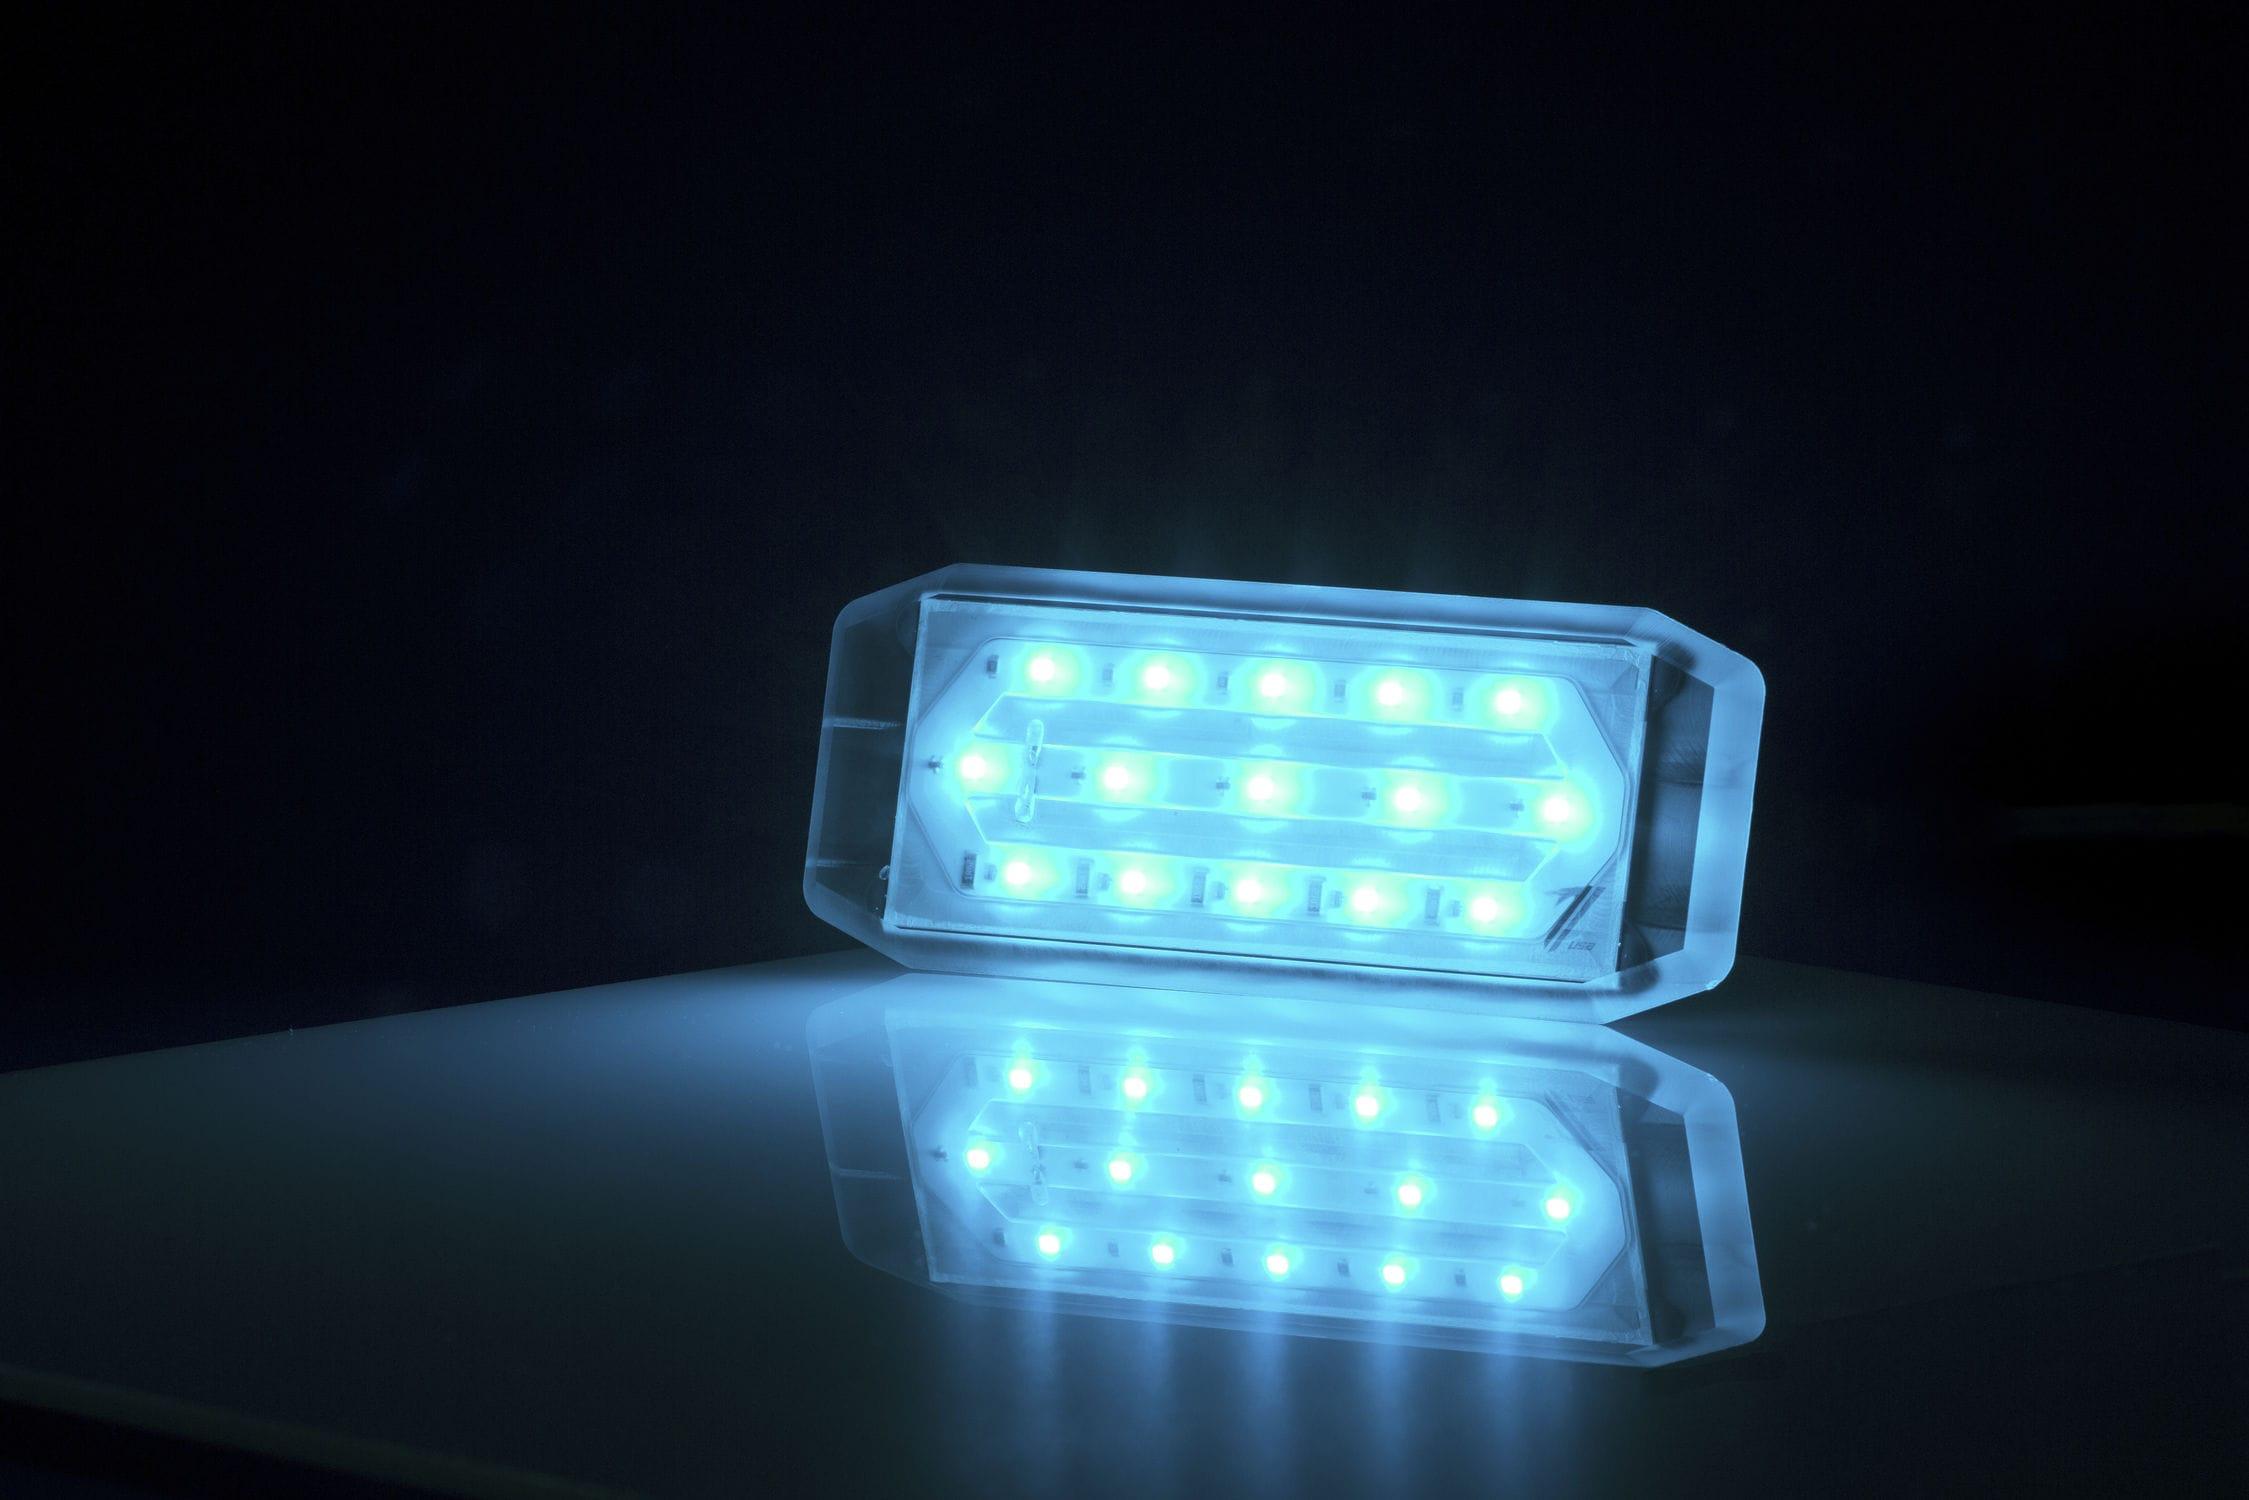 underwater boat light / led / surface-mount - miu15v3 - macris, Reel Combo